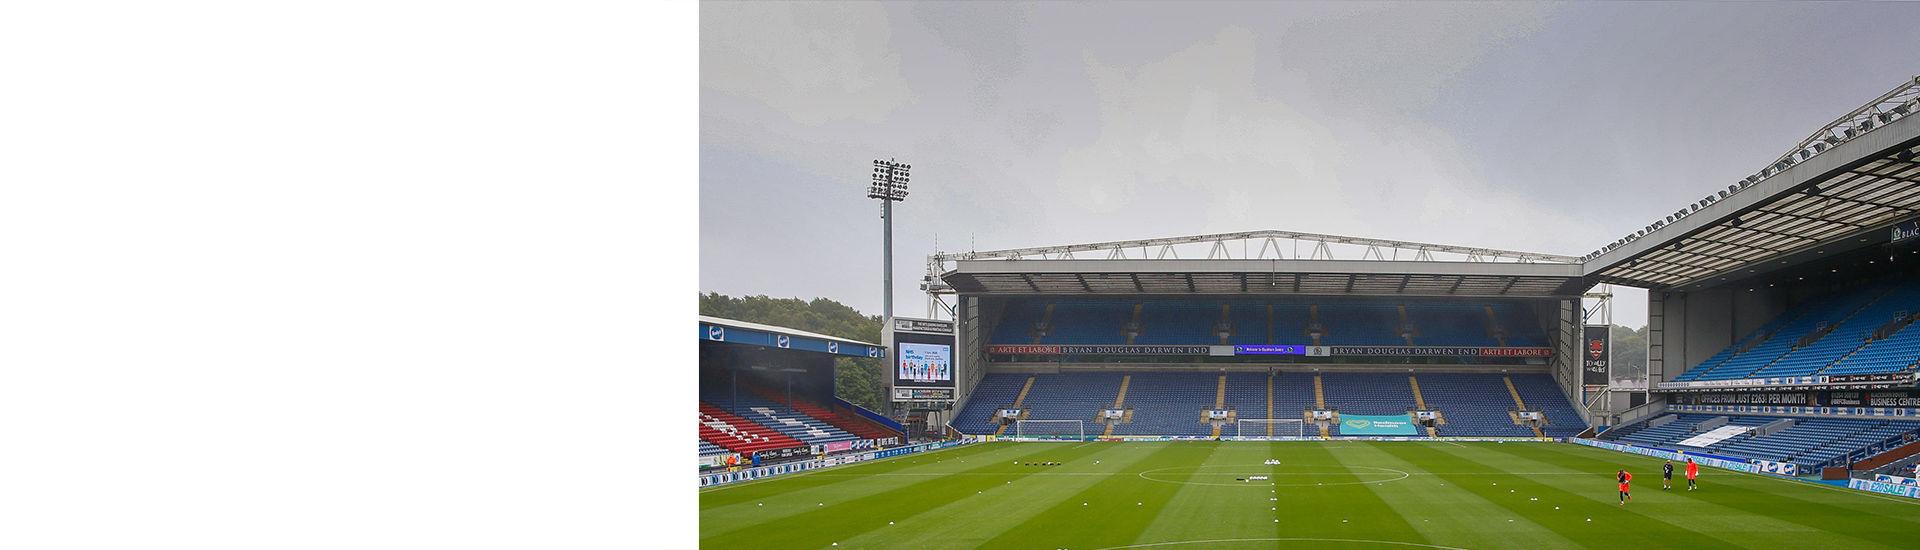 Live Updates: Blackburn Rovers vs Leeds United